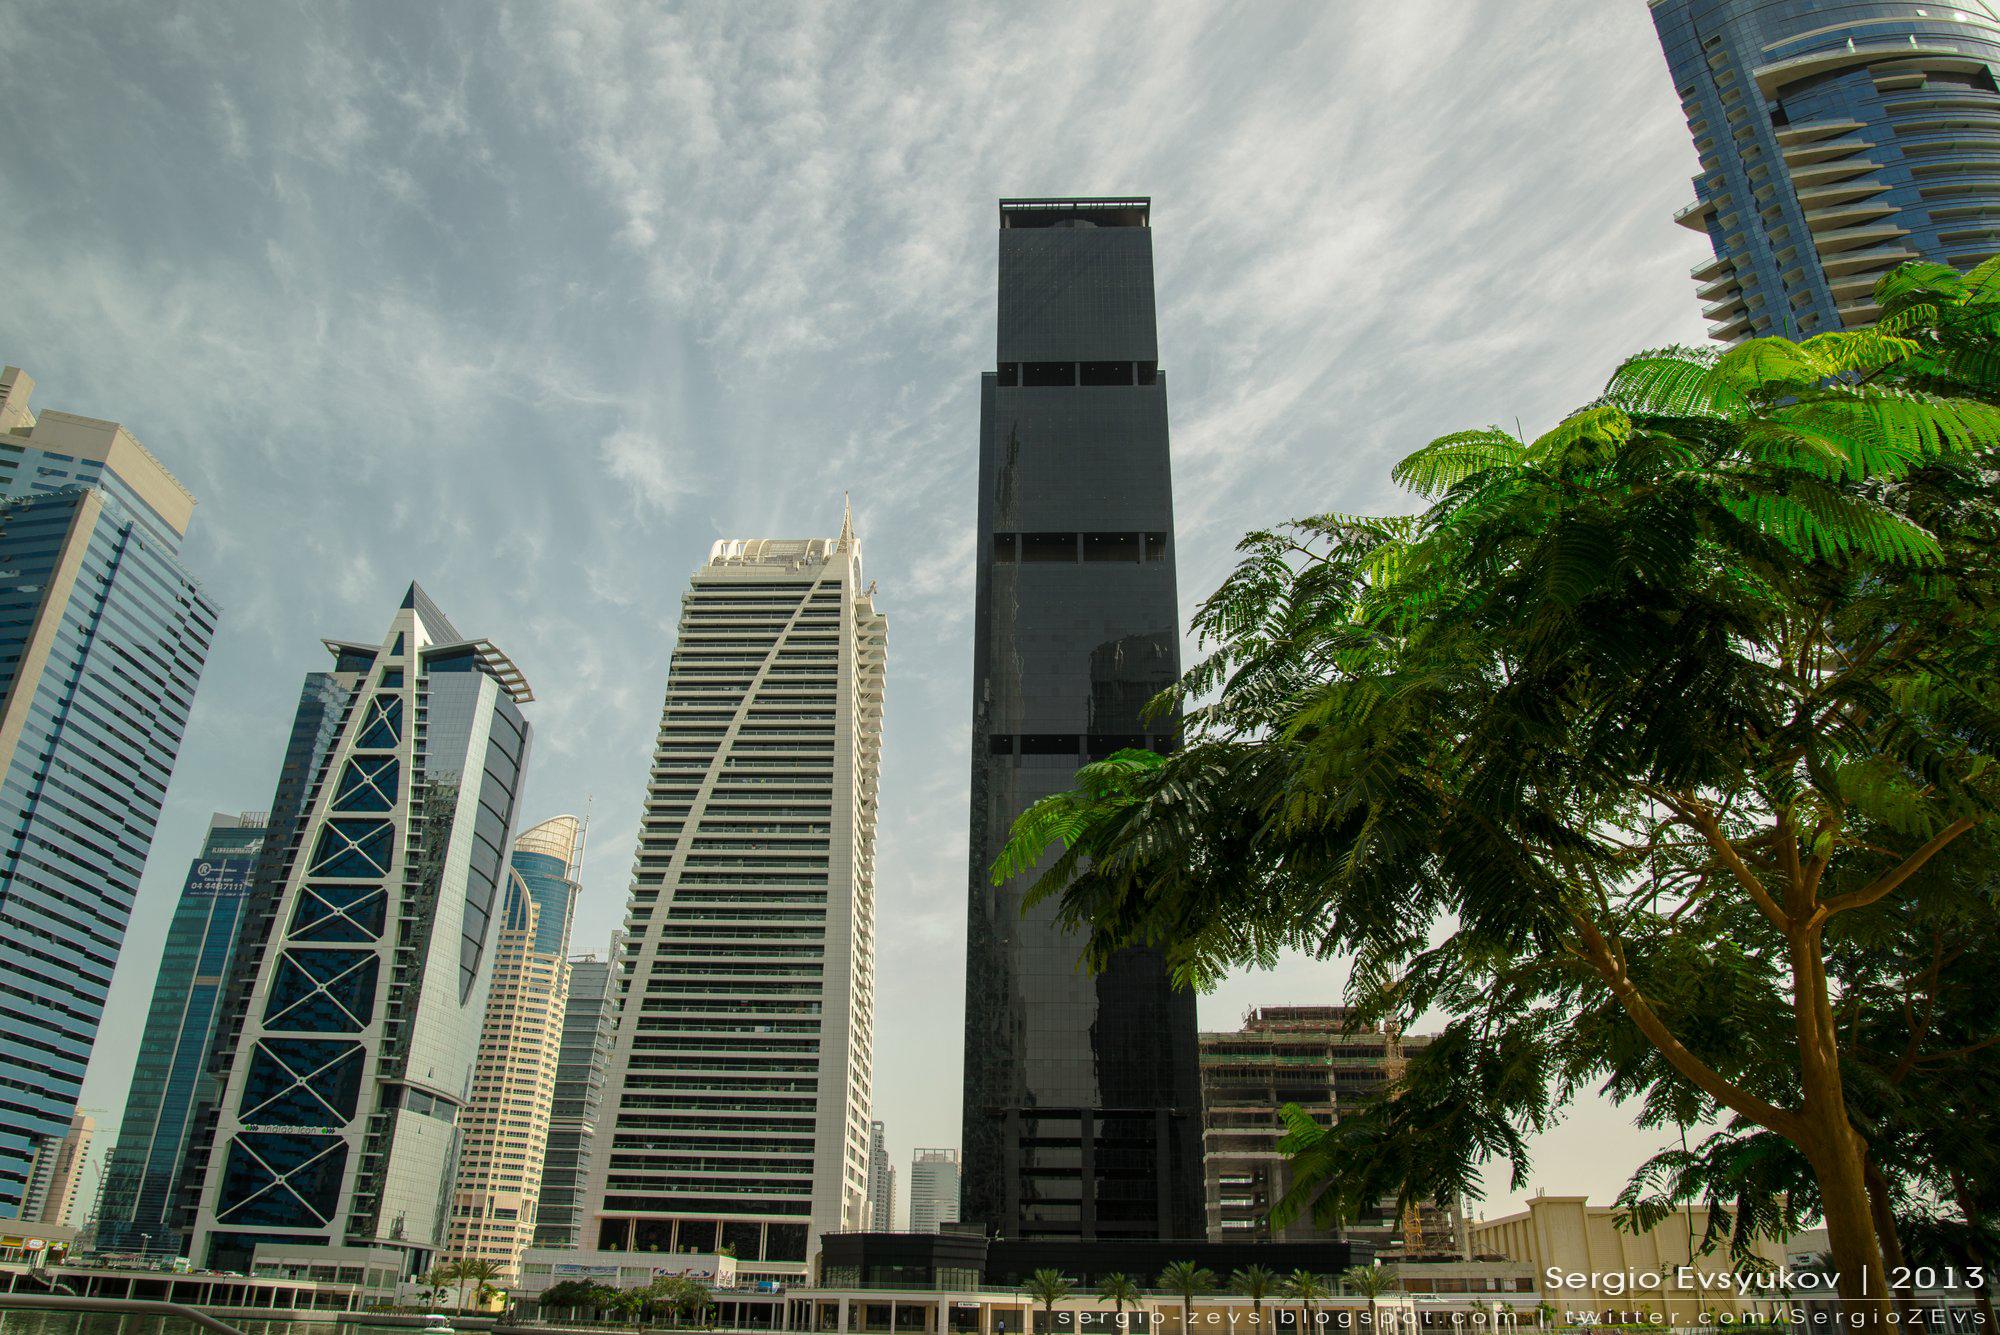 G2 Jumeirah Business Center 1, Дубай, Высотки, Панорама, путешествие, отдых, прогулка, променад, F3 Indigo Icon, JLT Lake,